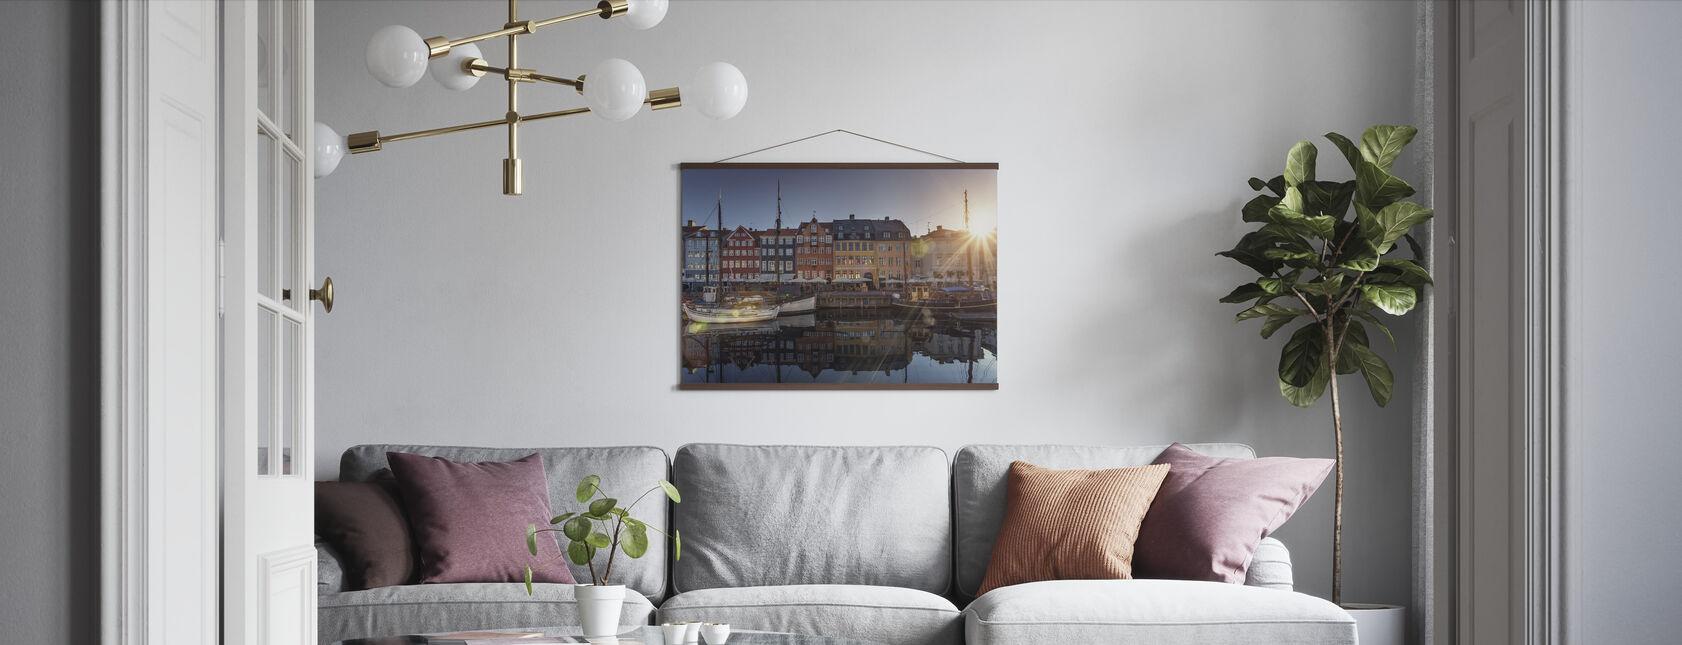 Solnedgang i Nyhavn, København, Danmark - Plakat - Stue